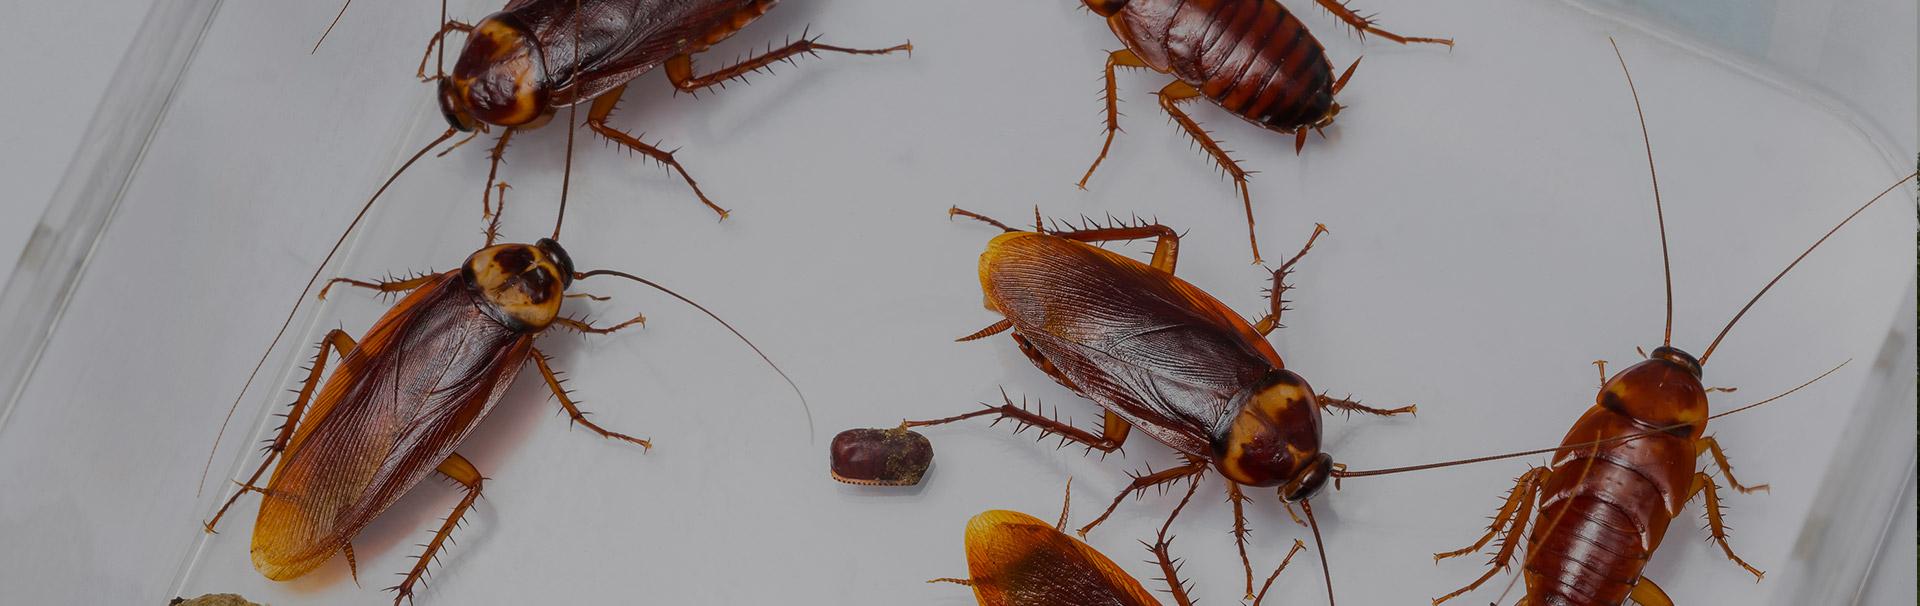 cockroachheader